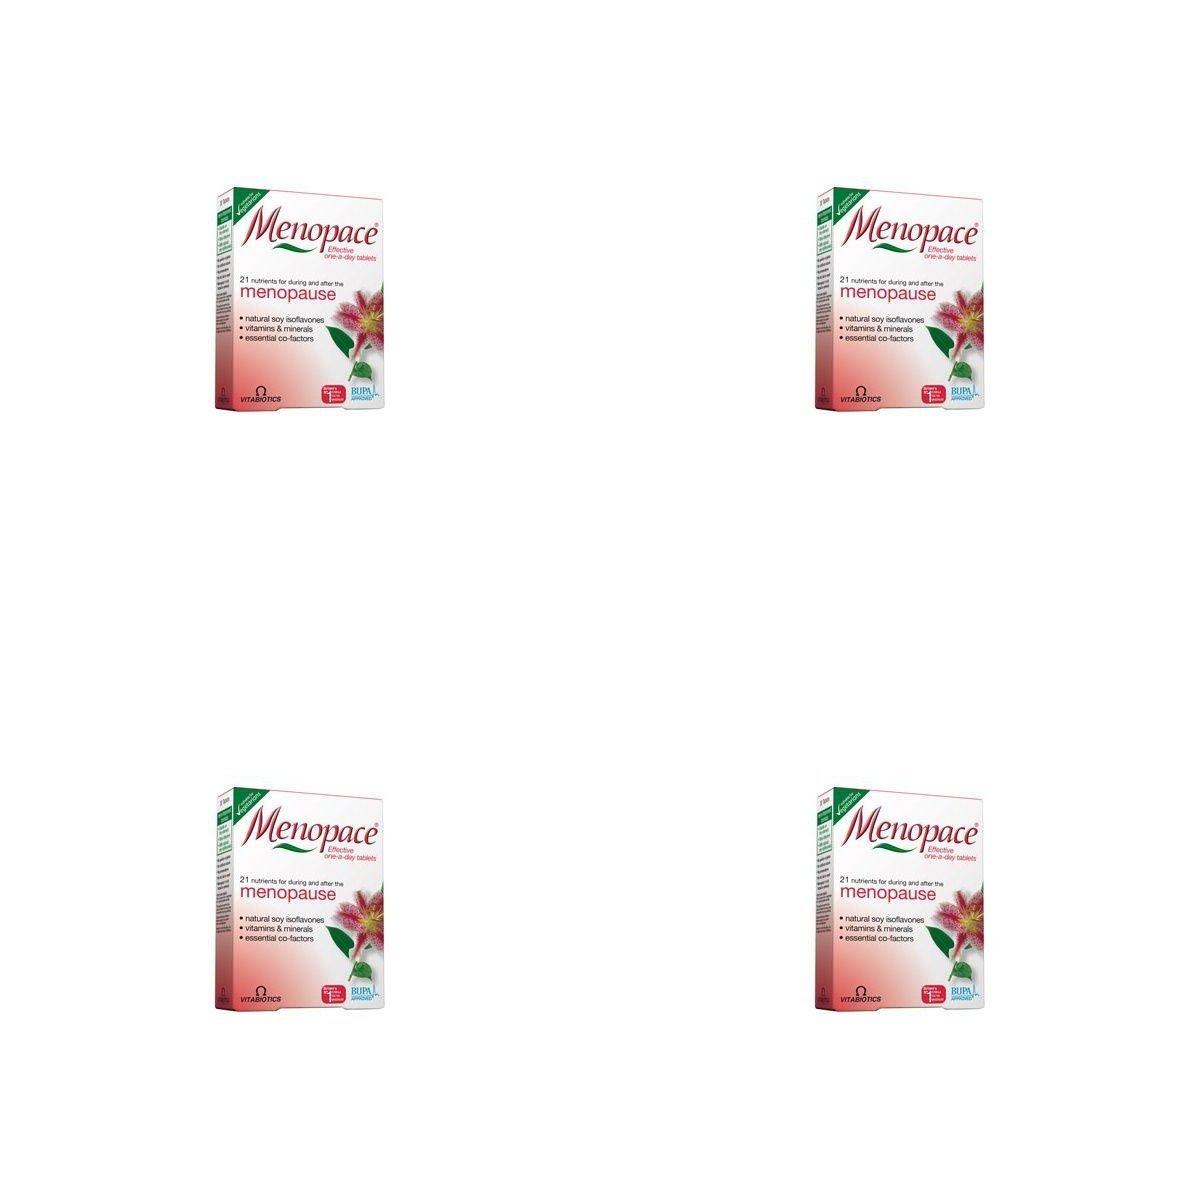 (4 PACK) - Vitabiotics Menopace Plus Tablets | 56s | 4 PACK - SUPER SAVER - SAVE MONEY